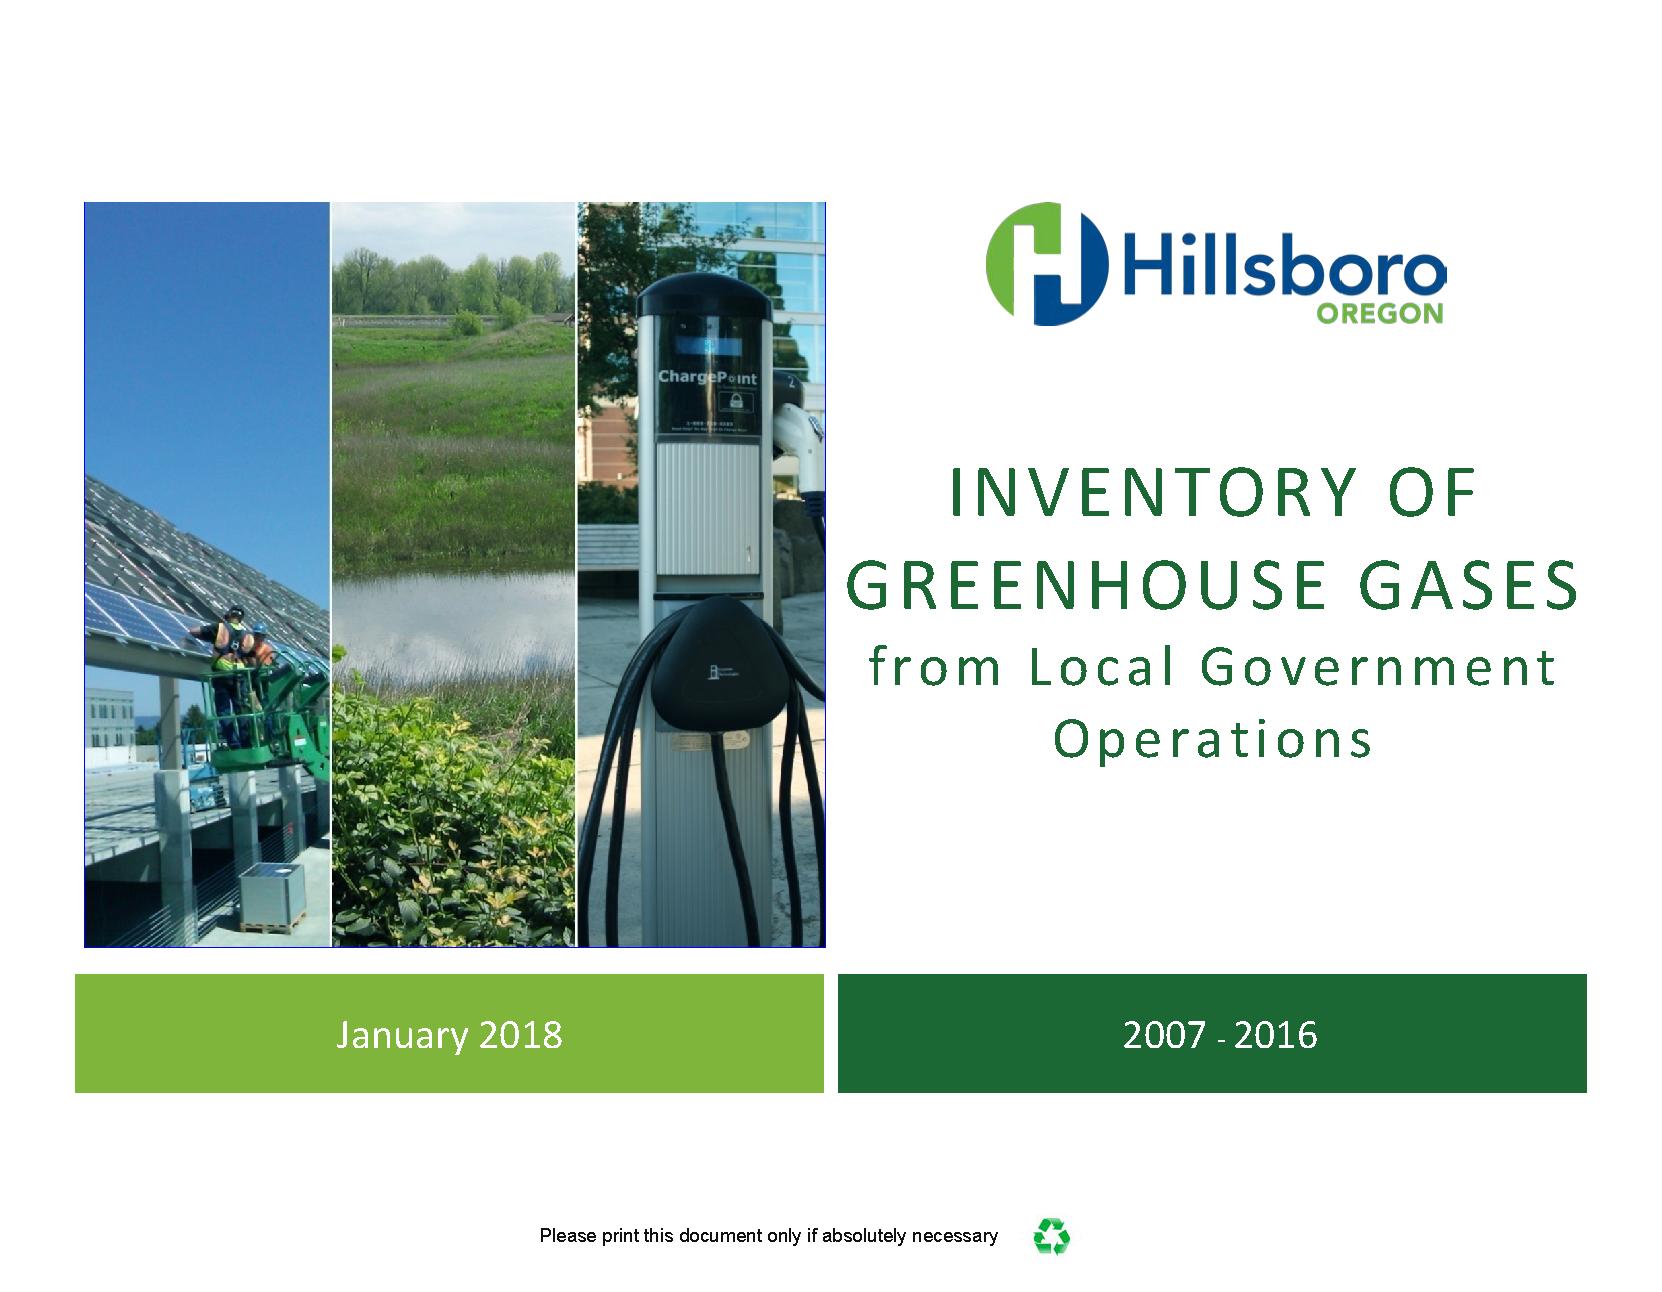 2007-2016 Hillsboro Greenhouse Gas Inventory Report